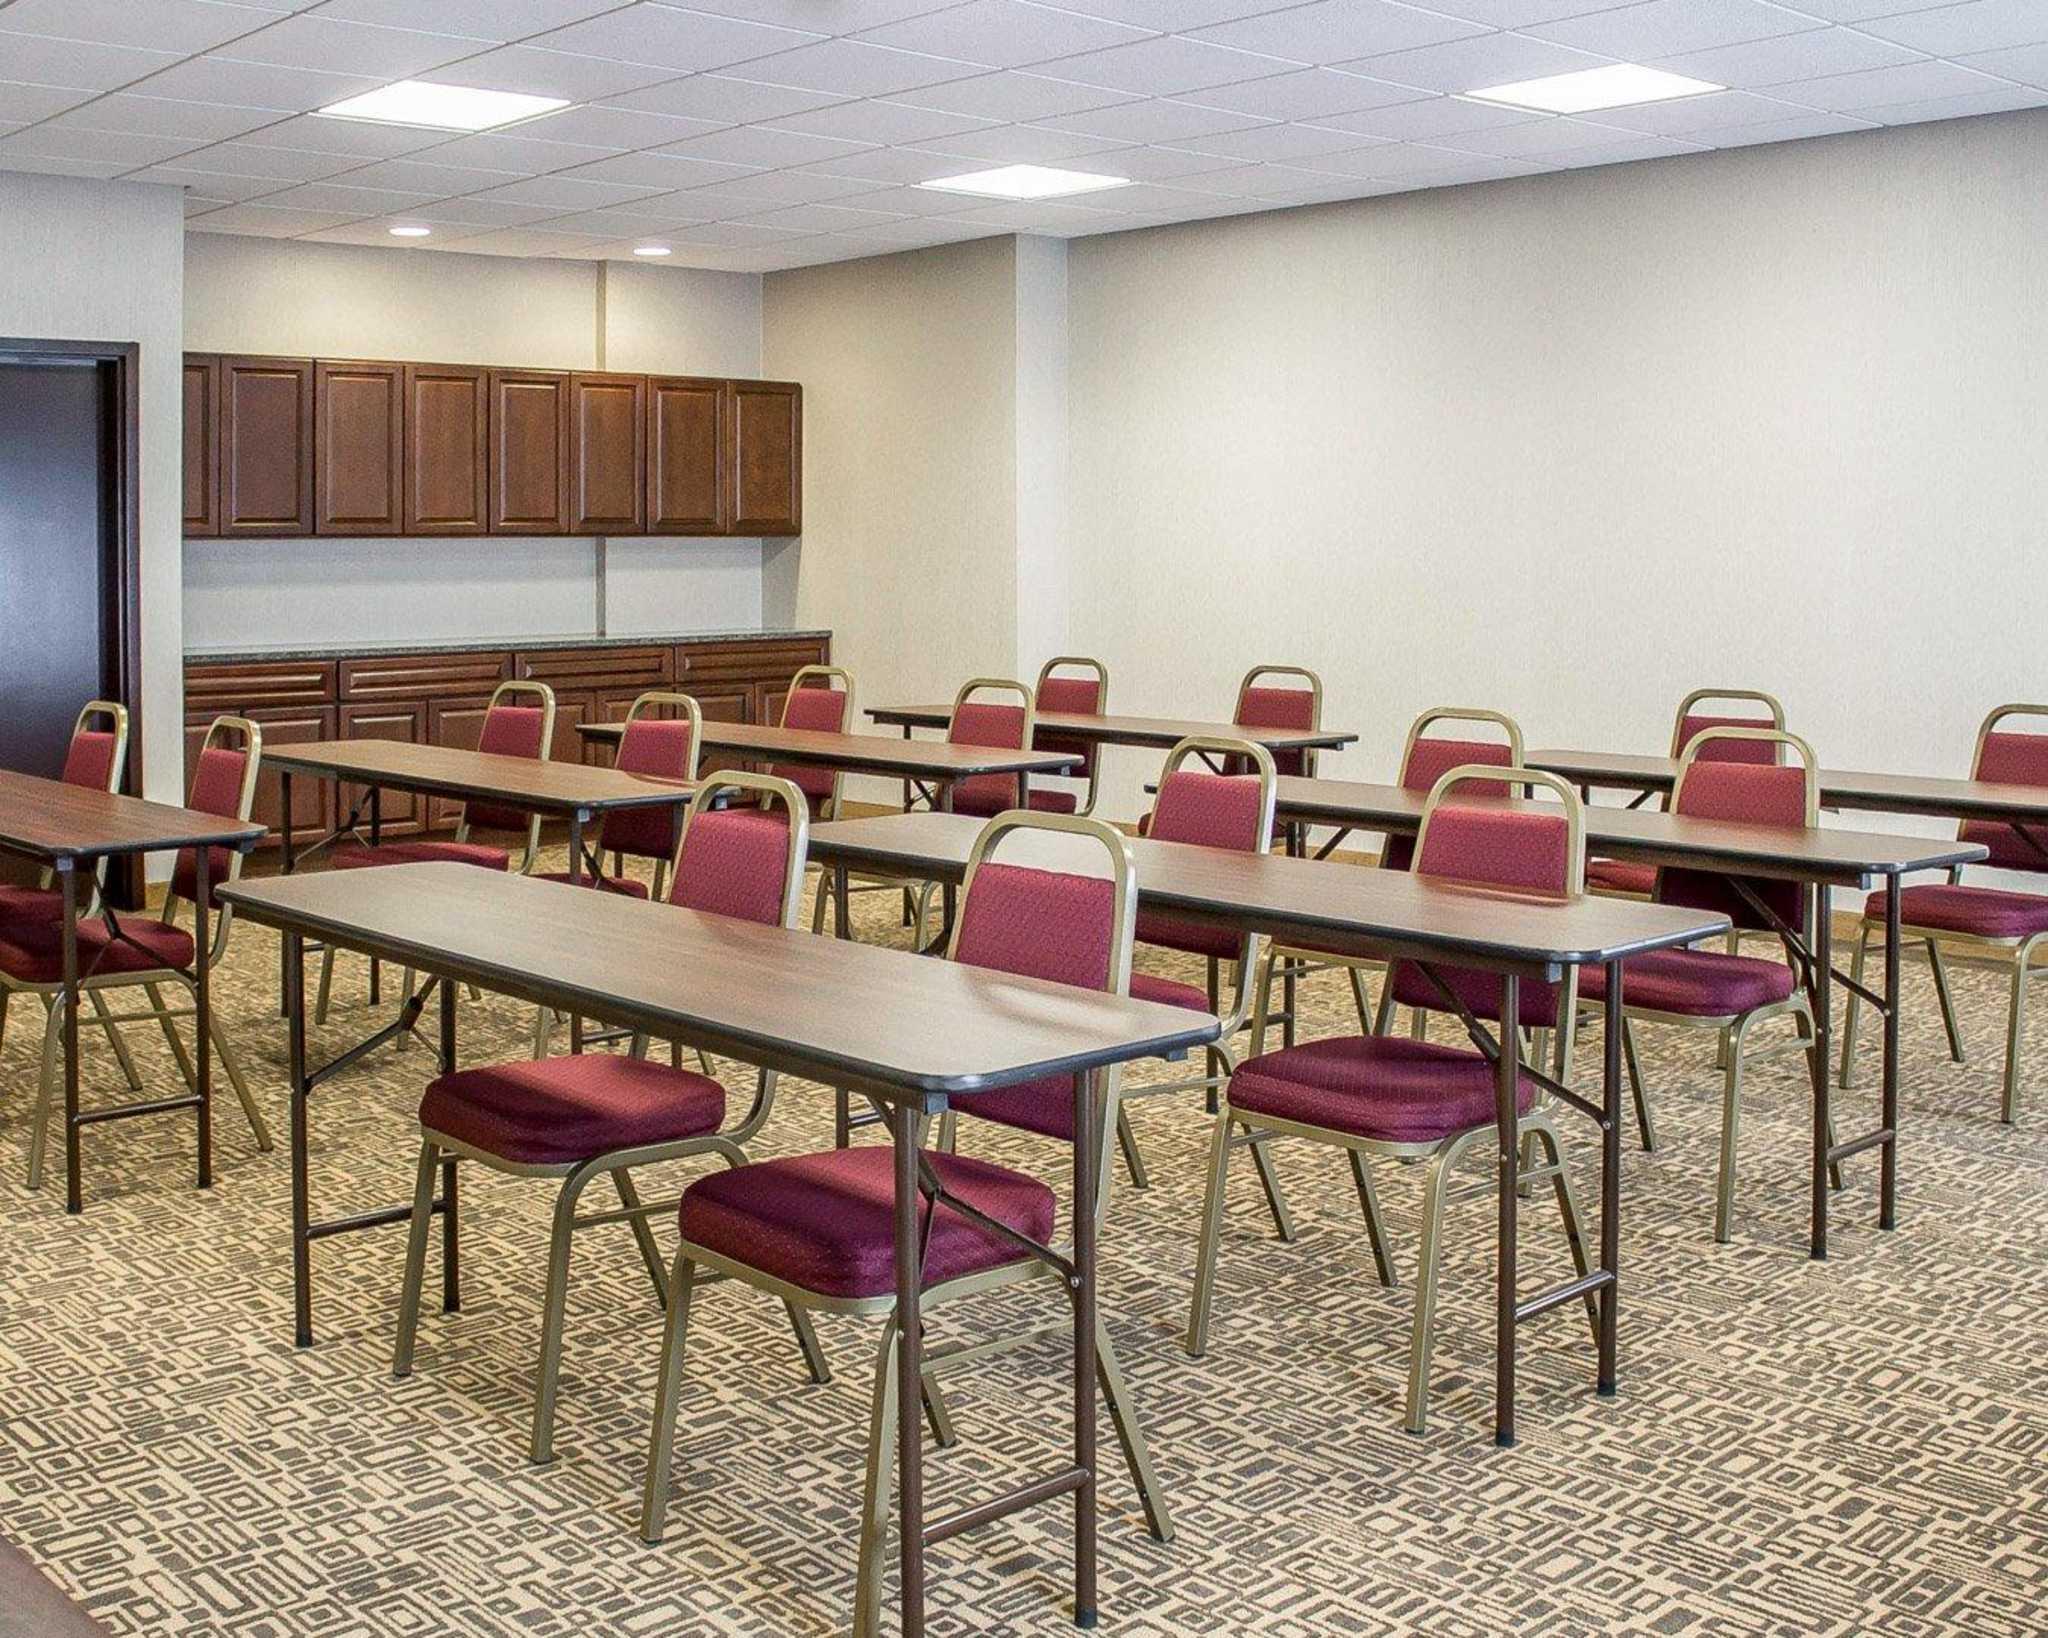 Comfort Suites Perrysburg - Toledo South image 11